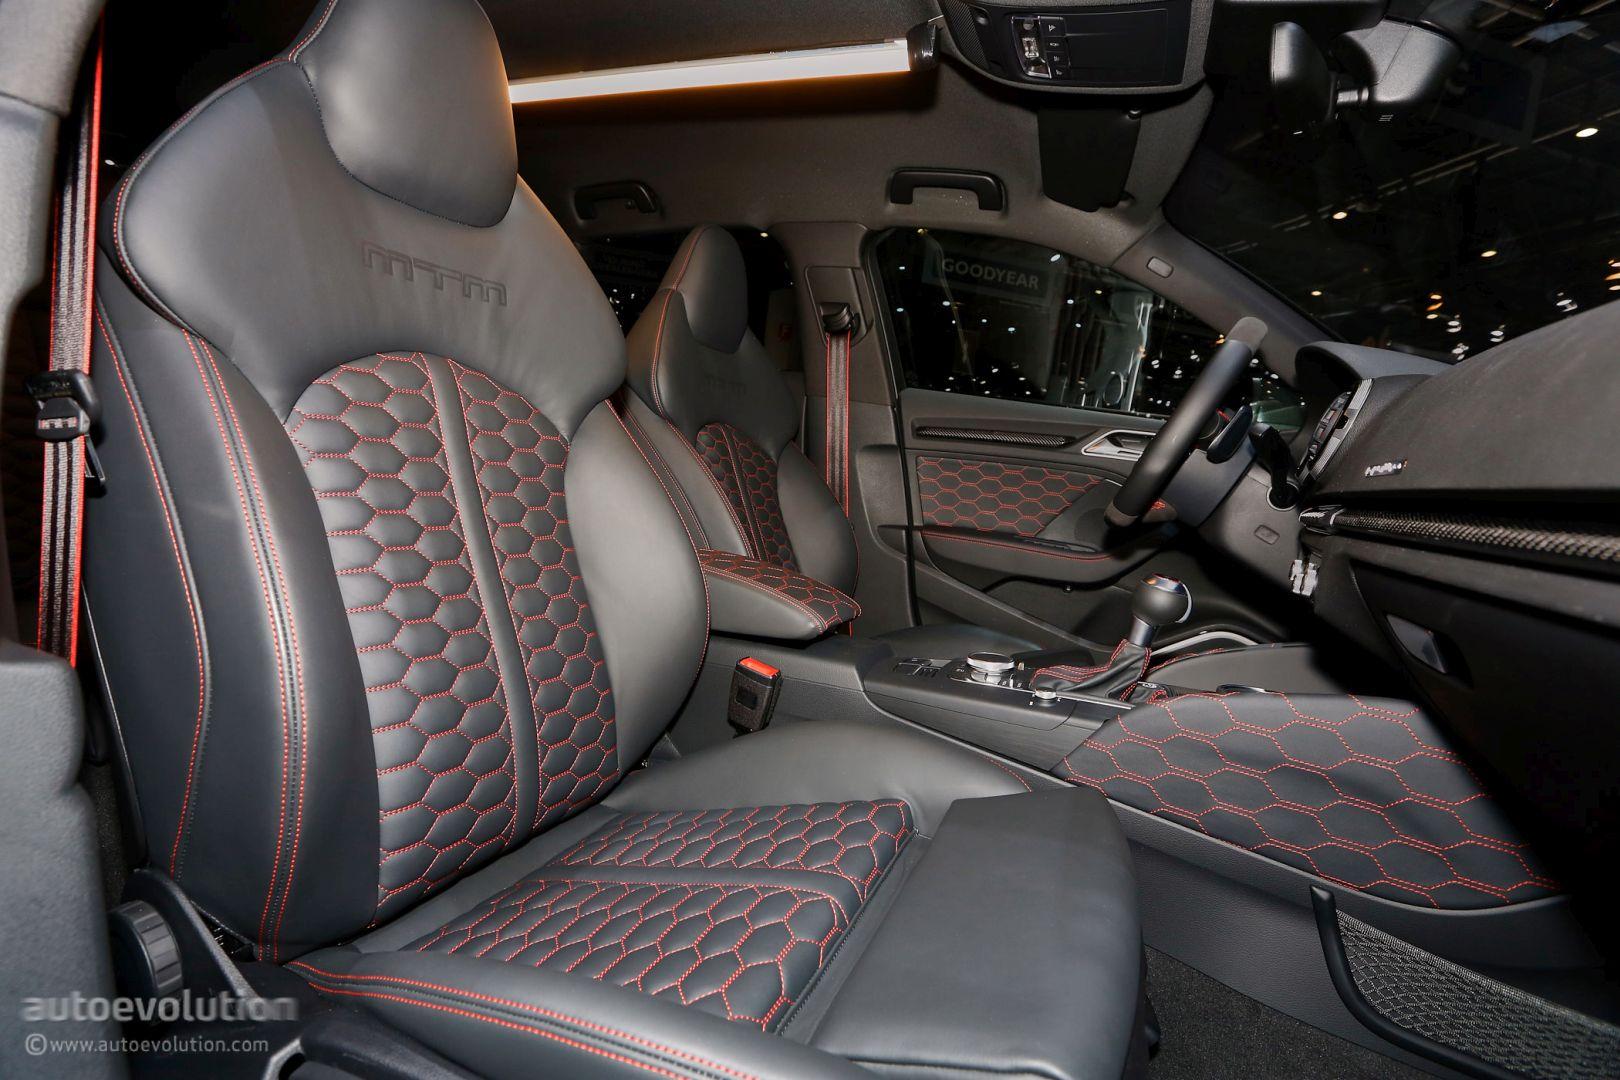 mtm-s-geneva-offensive-goes-from-hybrid-vw-t6-hot-van-to-opulent-800-hp-audi-s8_20.jpg